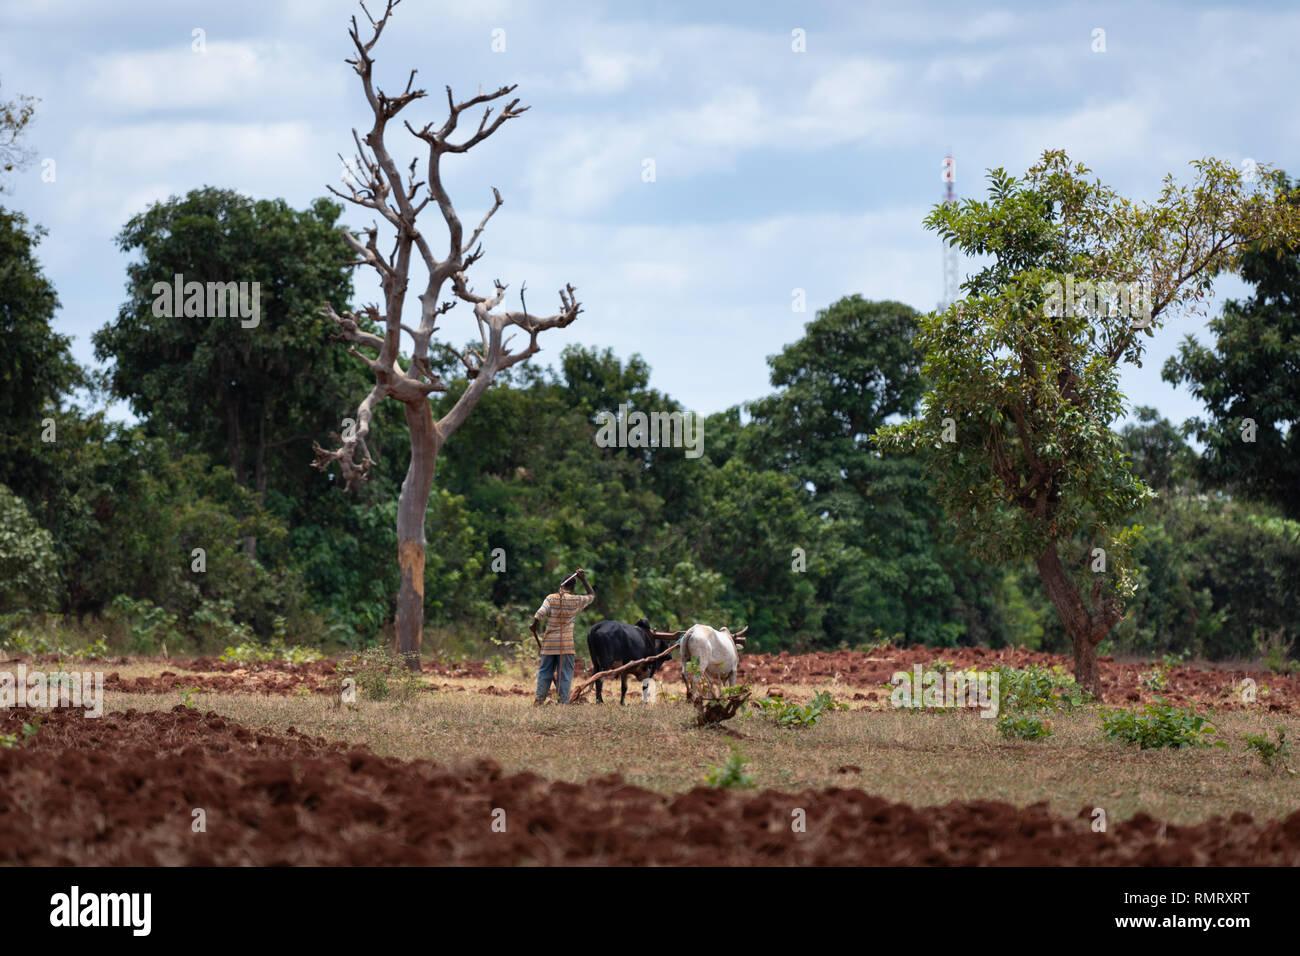 Subsistence agriculture in Ethiopia, Oromia region. - Stock Image